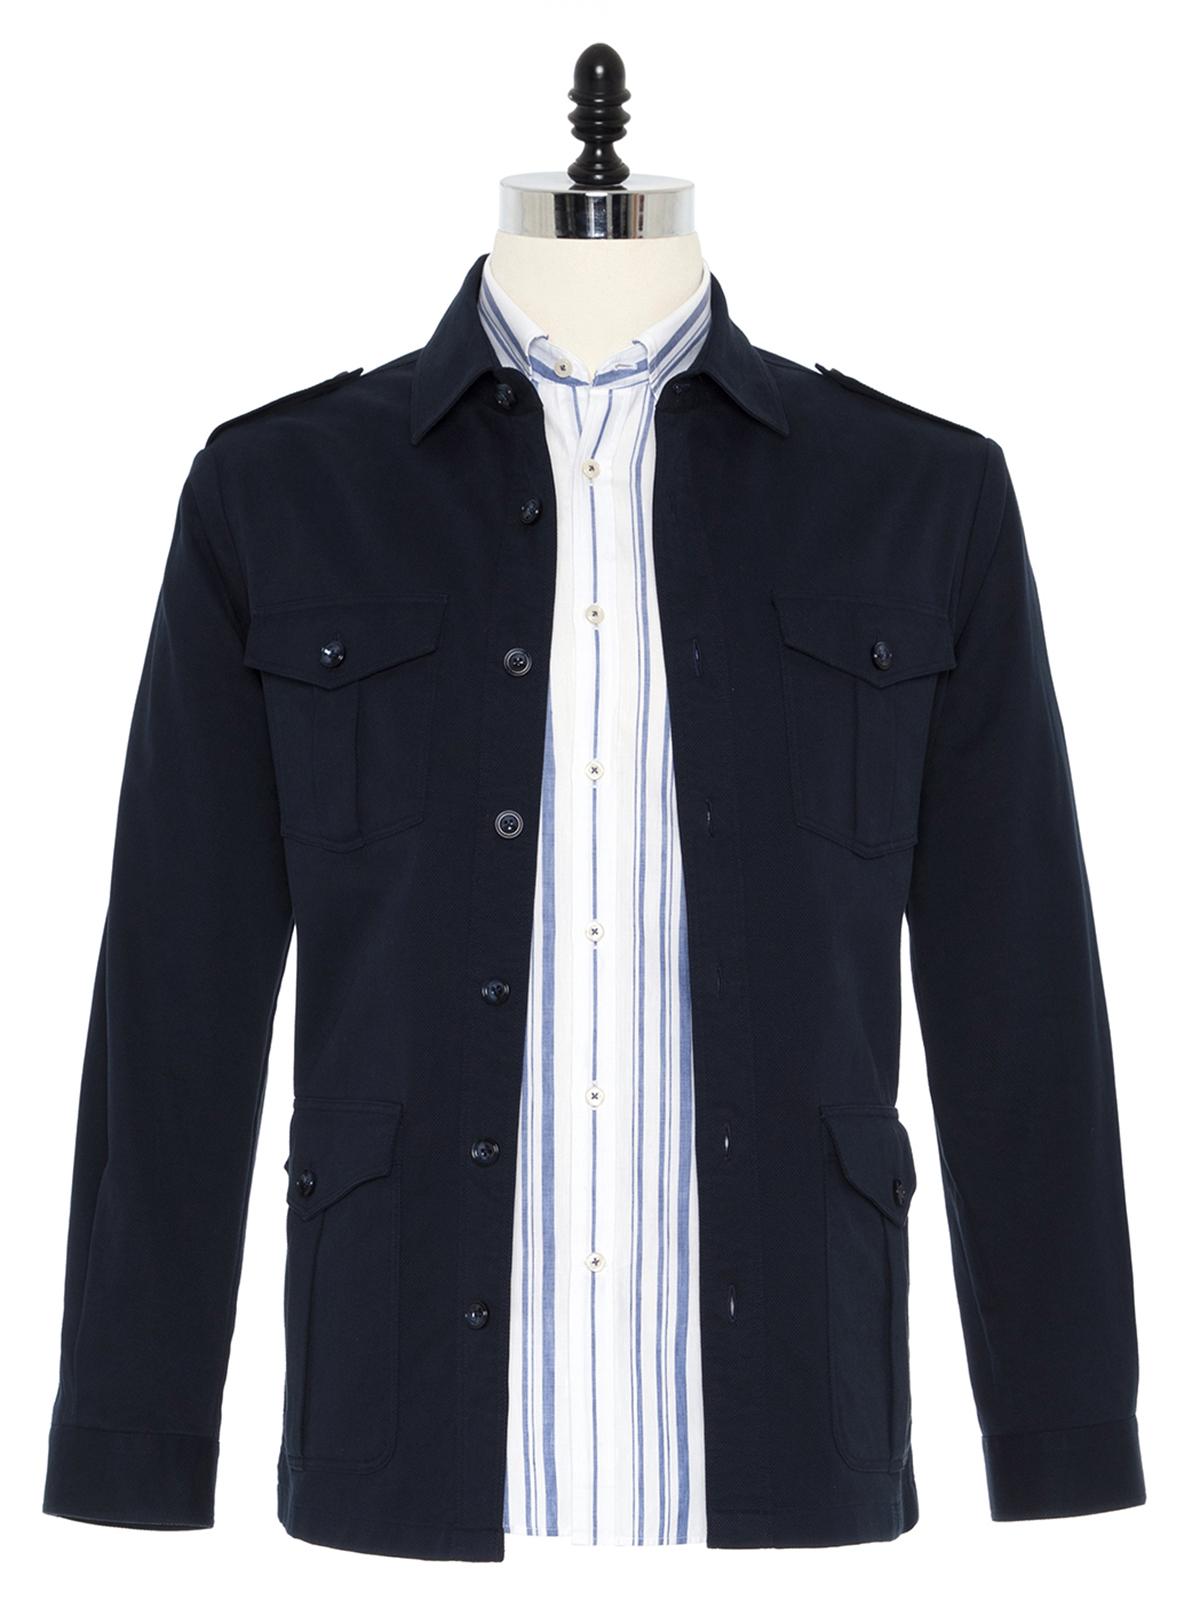 Germirli İndigo Lacivert Tailor Fit Ceket Gömlek